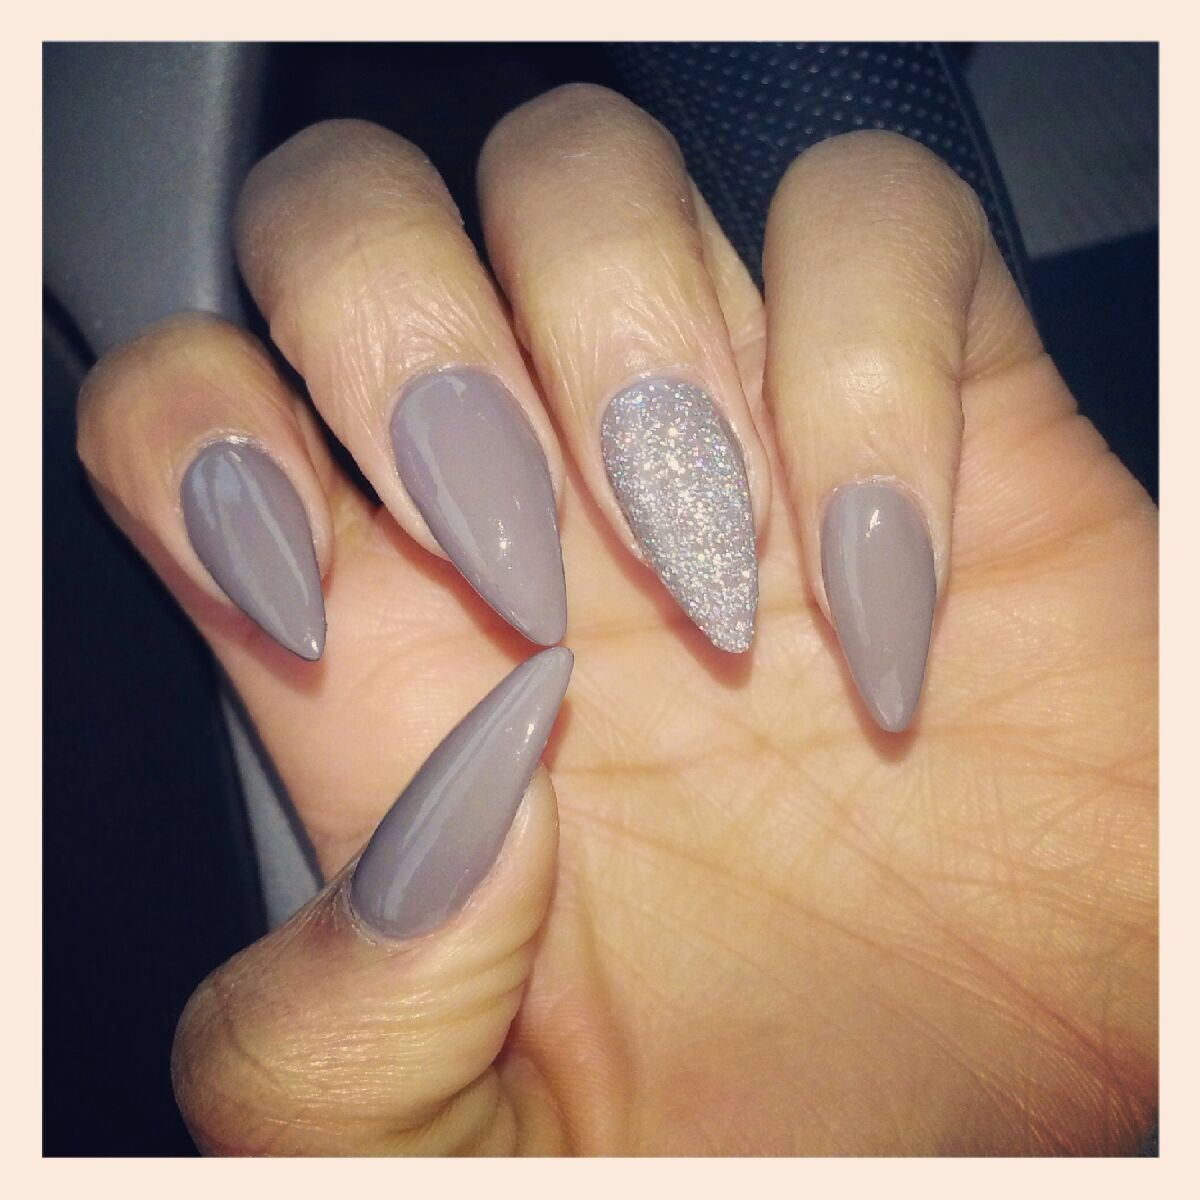 shaguftahussein nails pinterest nagelschere nageldesign und fingern gel. Black Bedroom Furniture Sets. Home Design Ideas